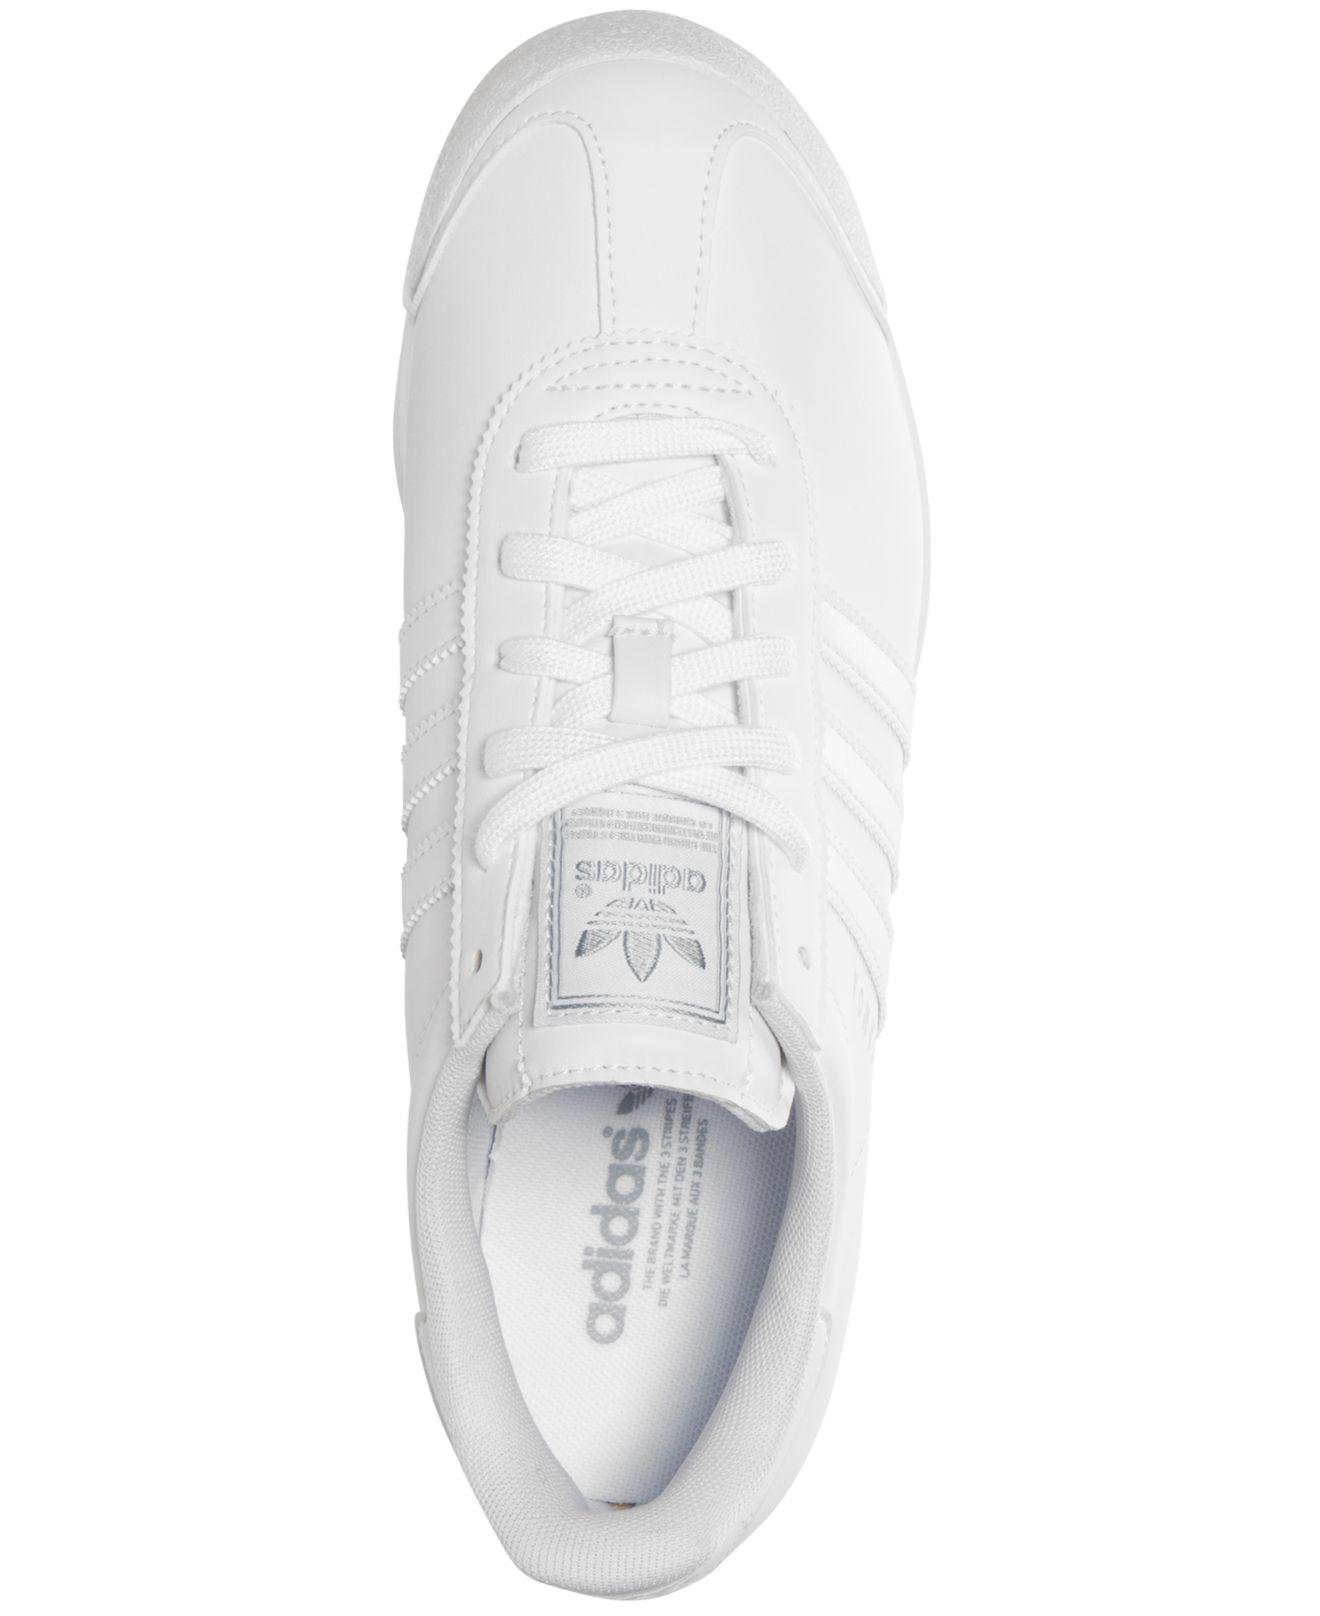 adidas samoa women's white